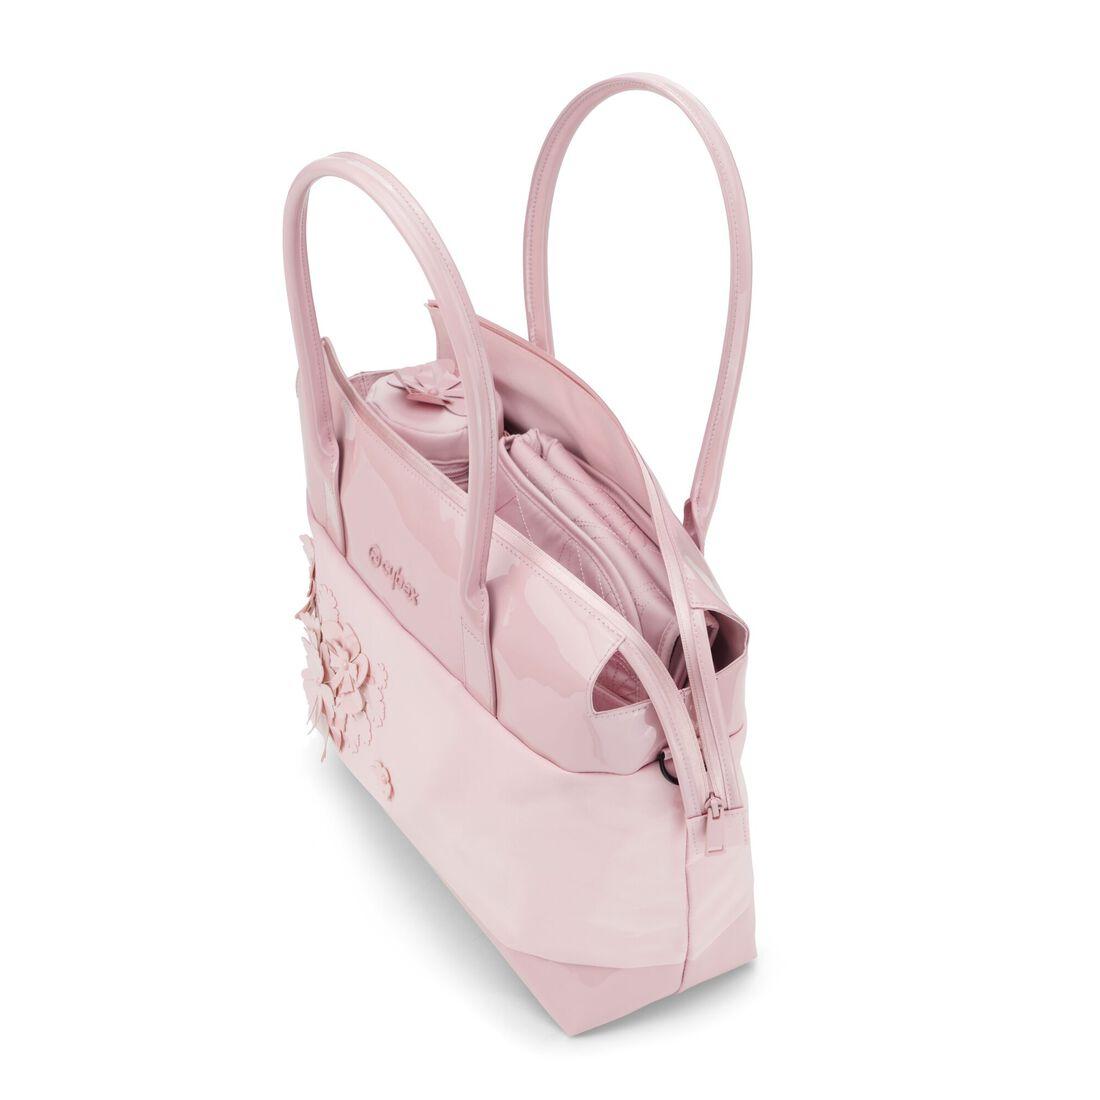 CYBEX Wickeltasche Simply Flowers - Pink in Pale Blush large Bild 2